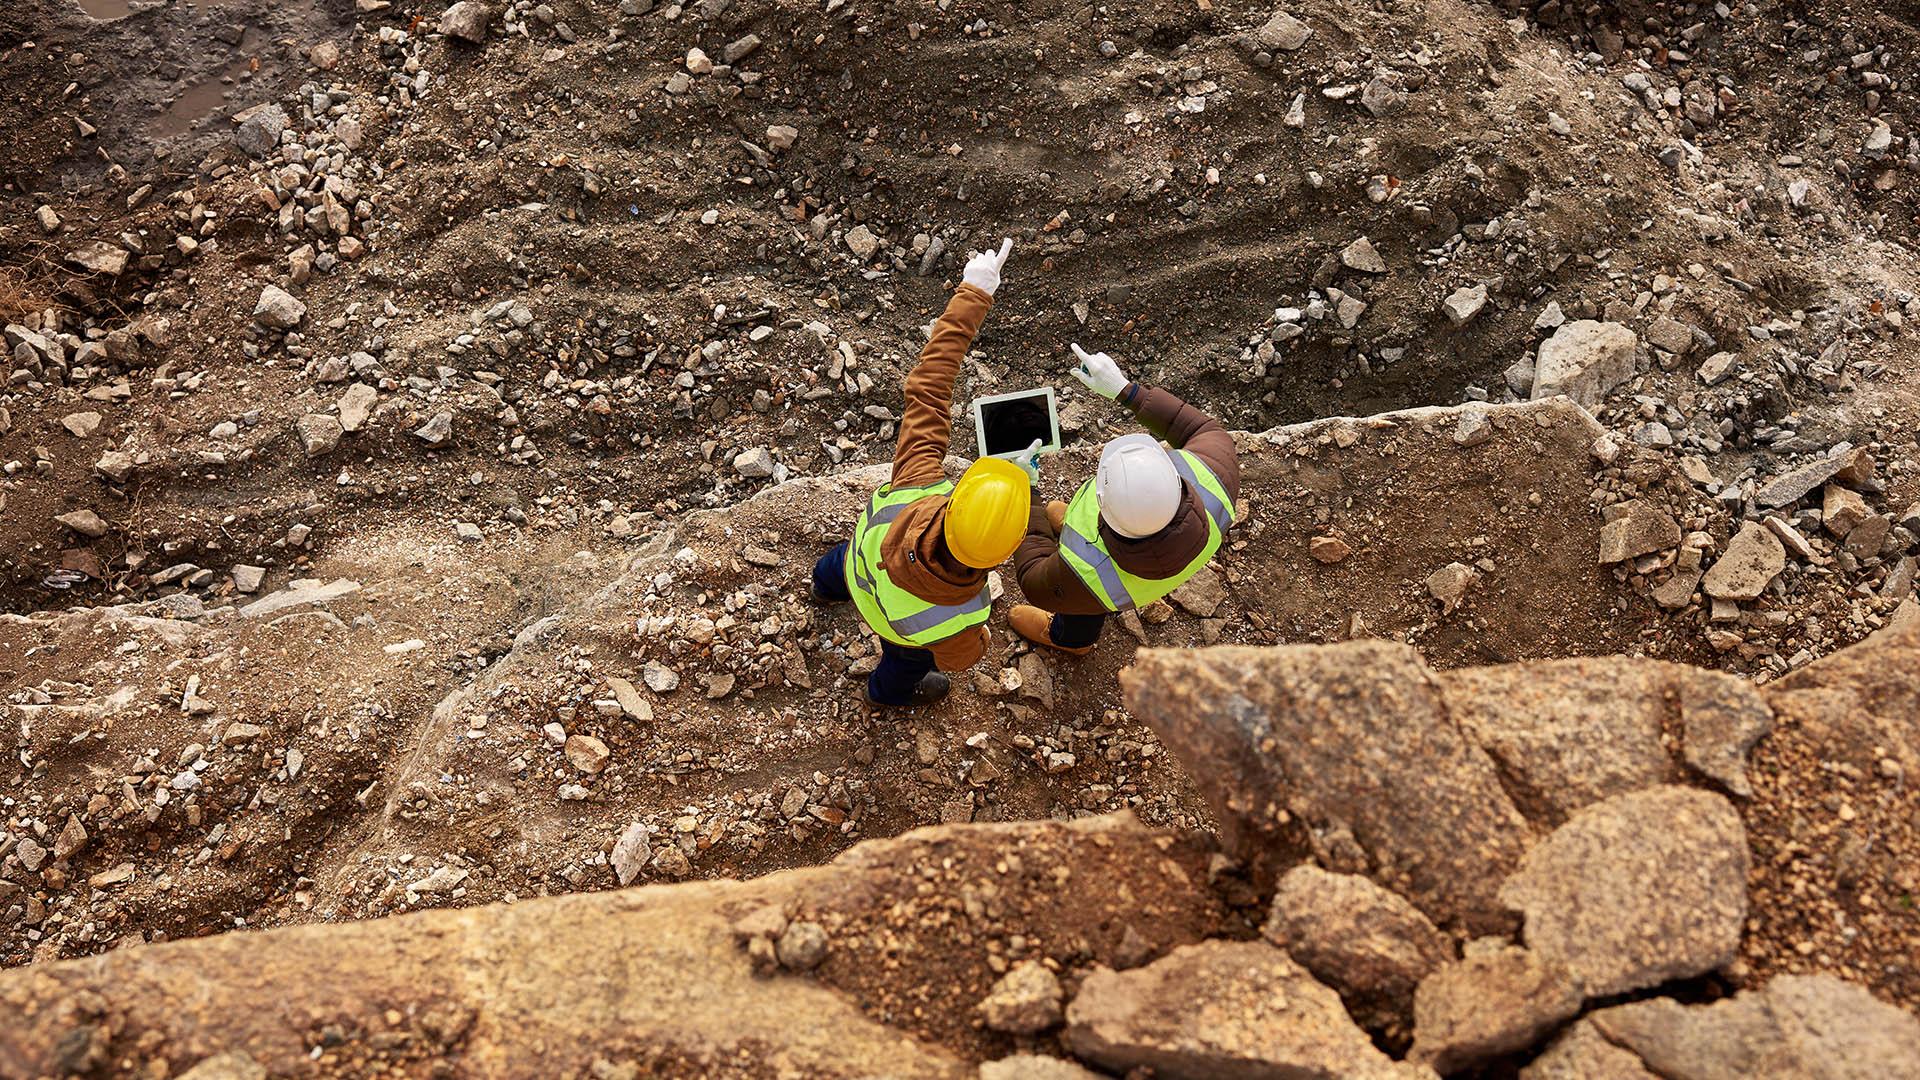 Rio Tinto (ASX:RIO) discovers new gold zone at Winu project